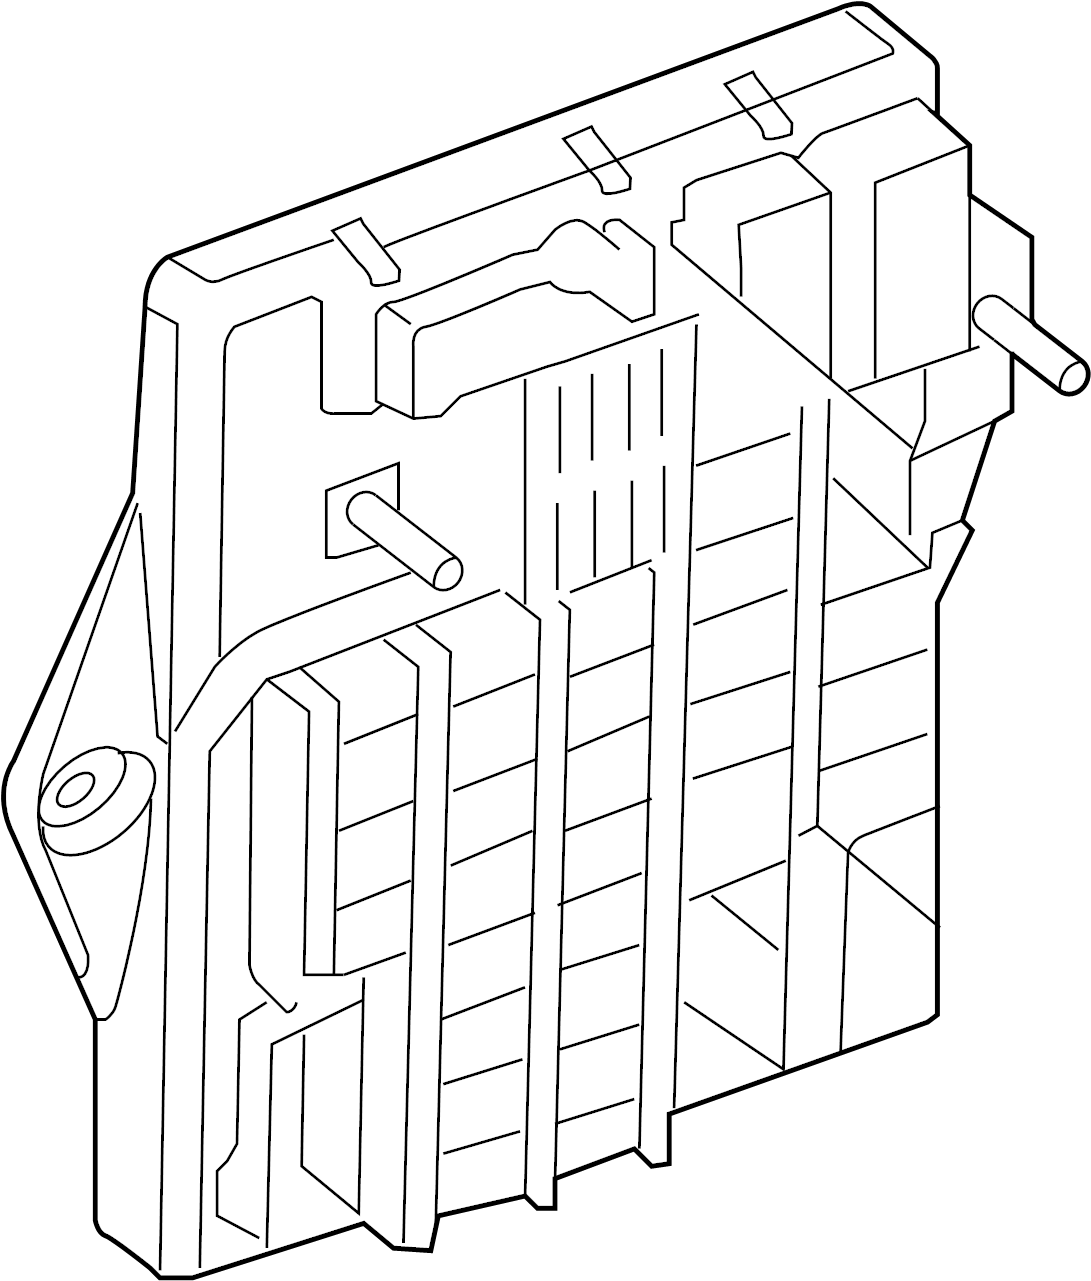 Jaguar Vanden Plas Fuse AND relay box. Fuse box. FUSEBOX